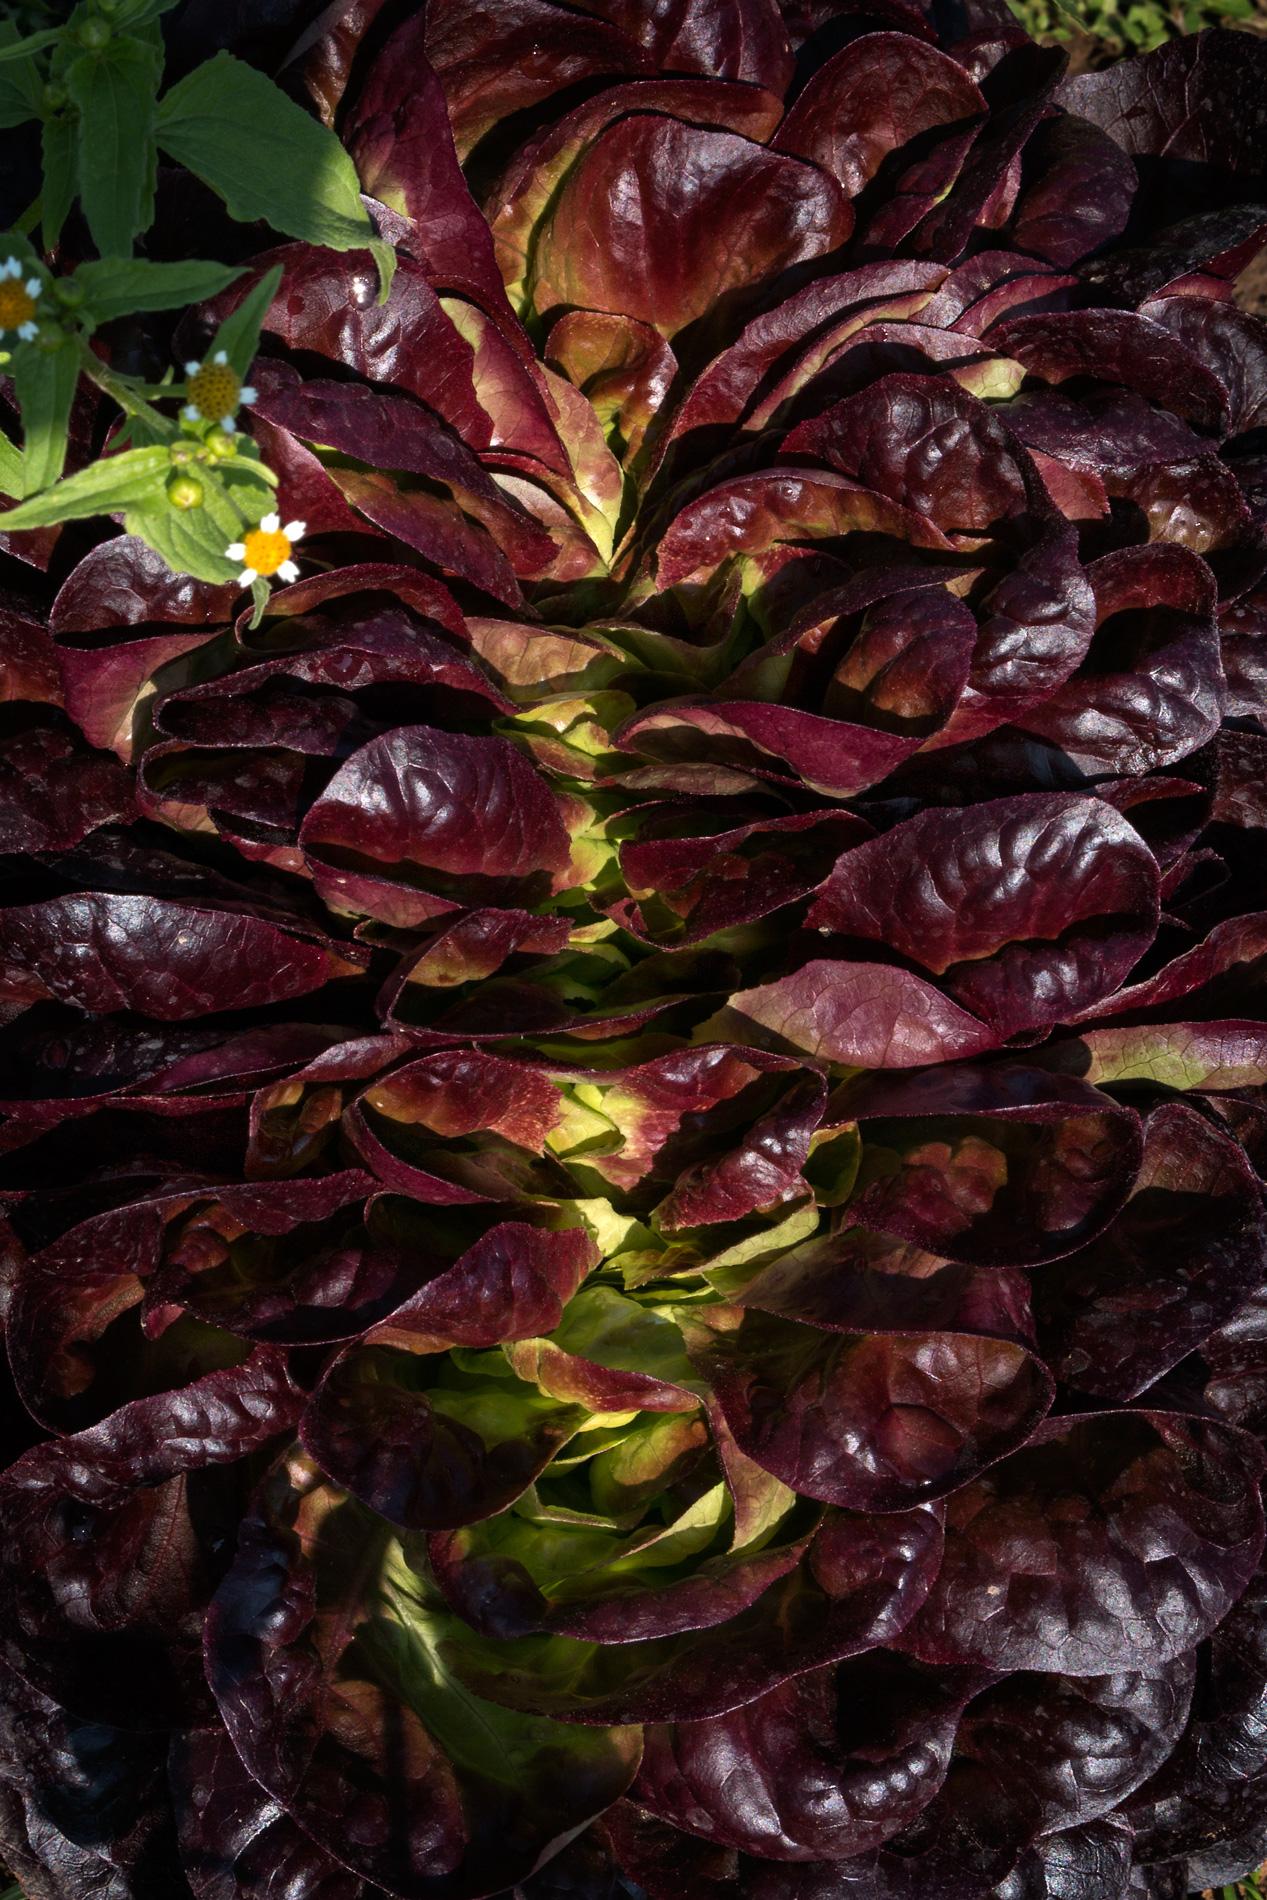 Salat im Freiland